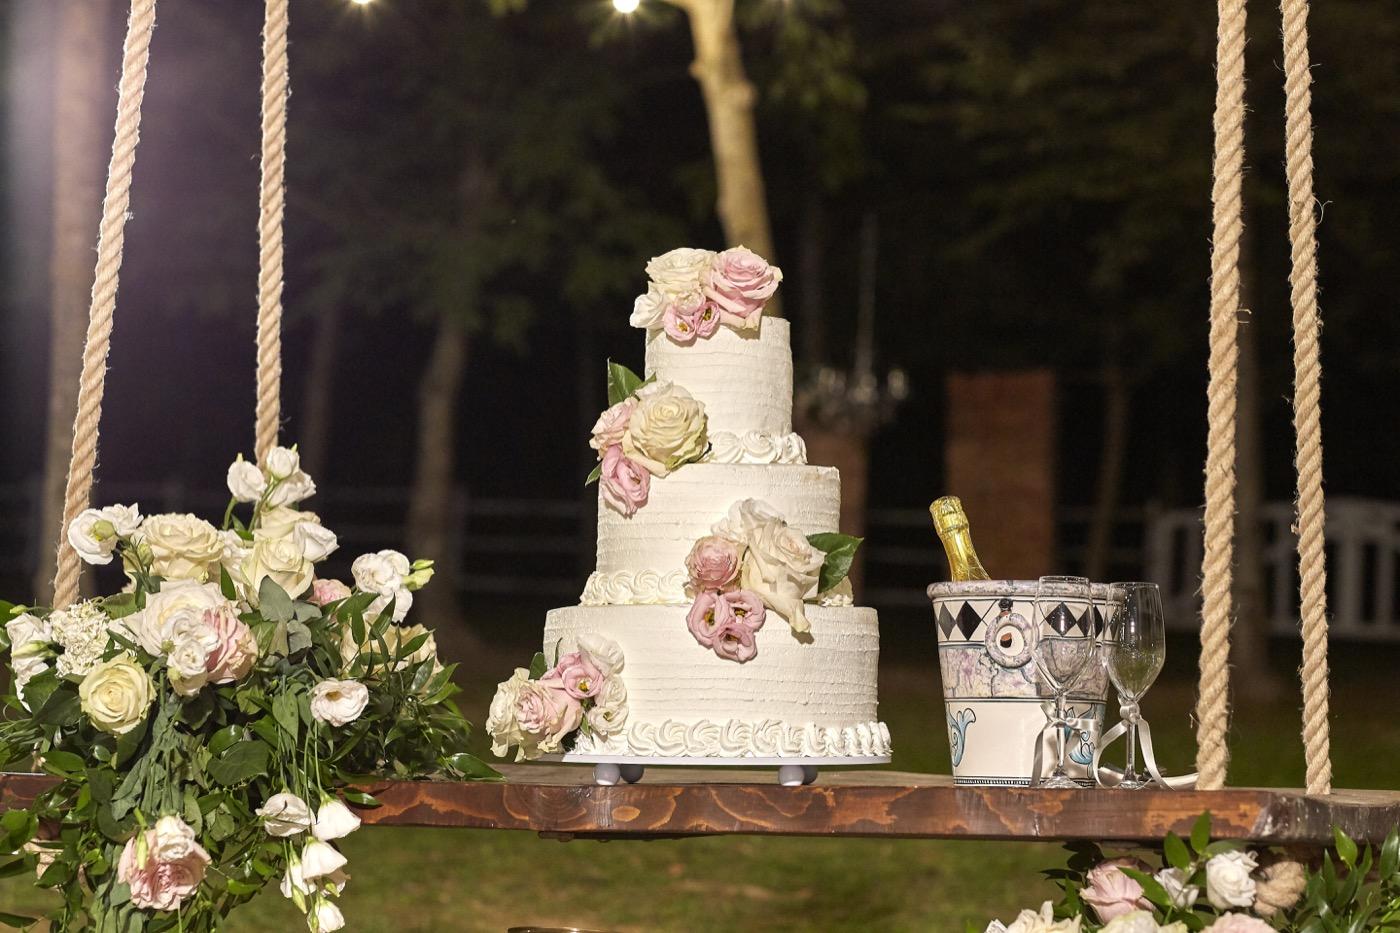 Claudio-Coppola-wedding-photographer-la-scuderia-eventi-preparativi-la-rosetta-perugia-89